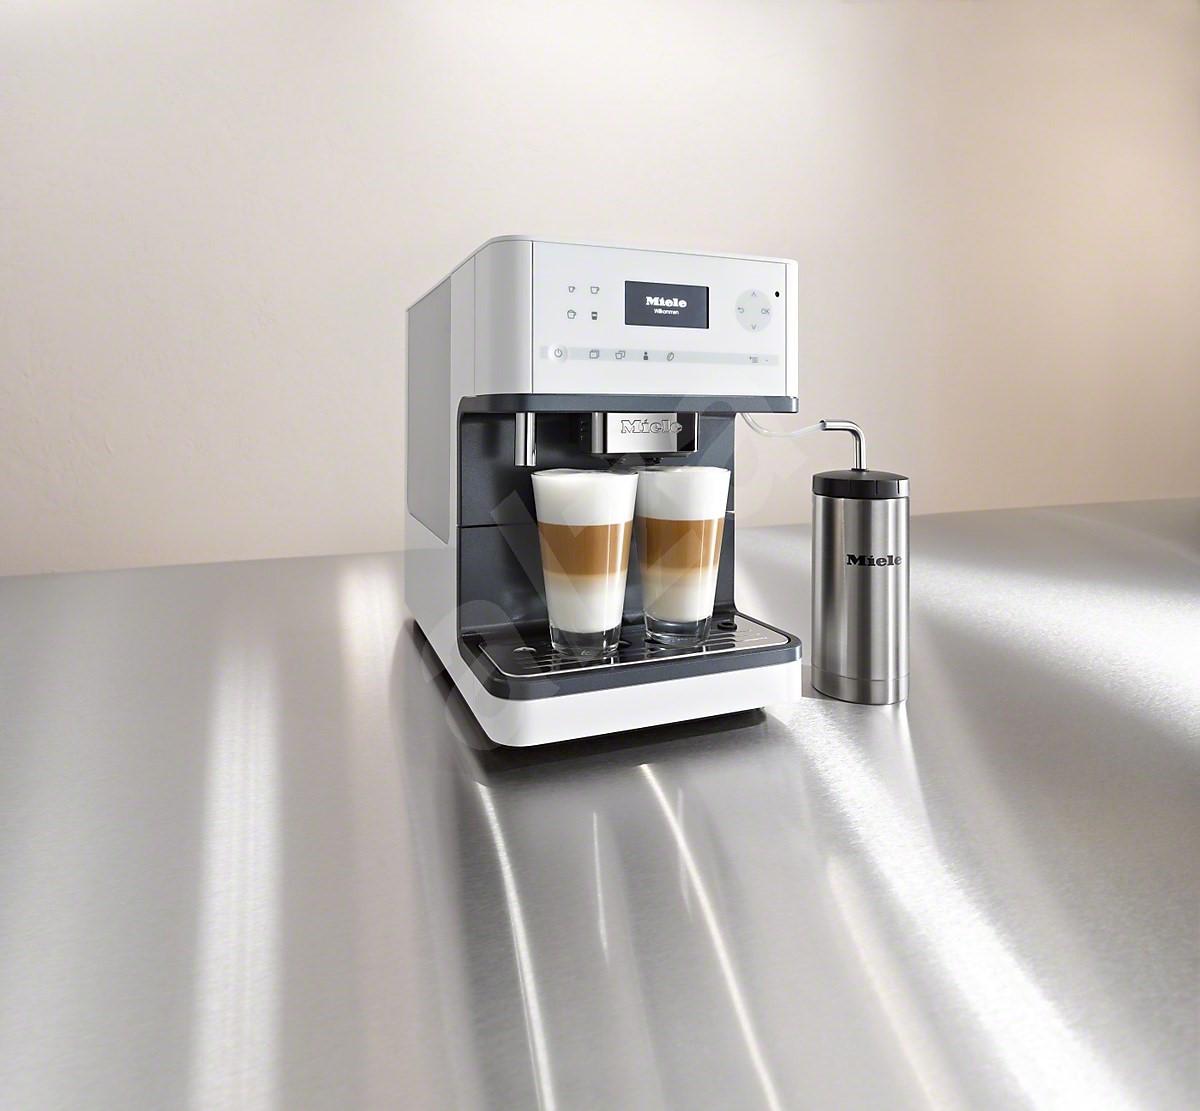 miele cm 6310 b l espresso. Black Bedroom Furniture Sets. Home Design Ideas